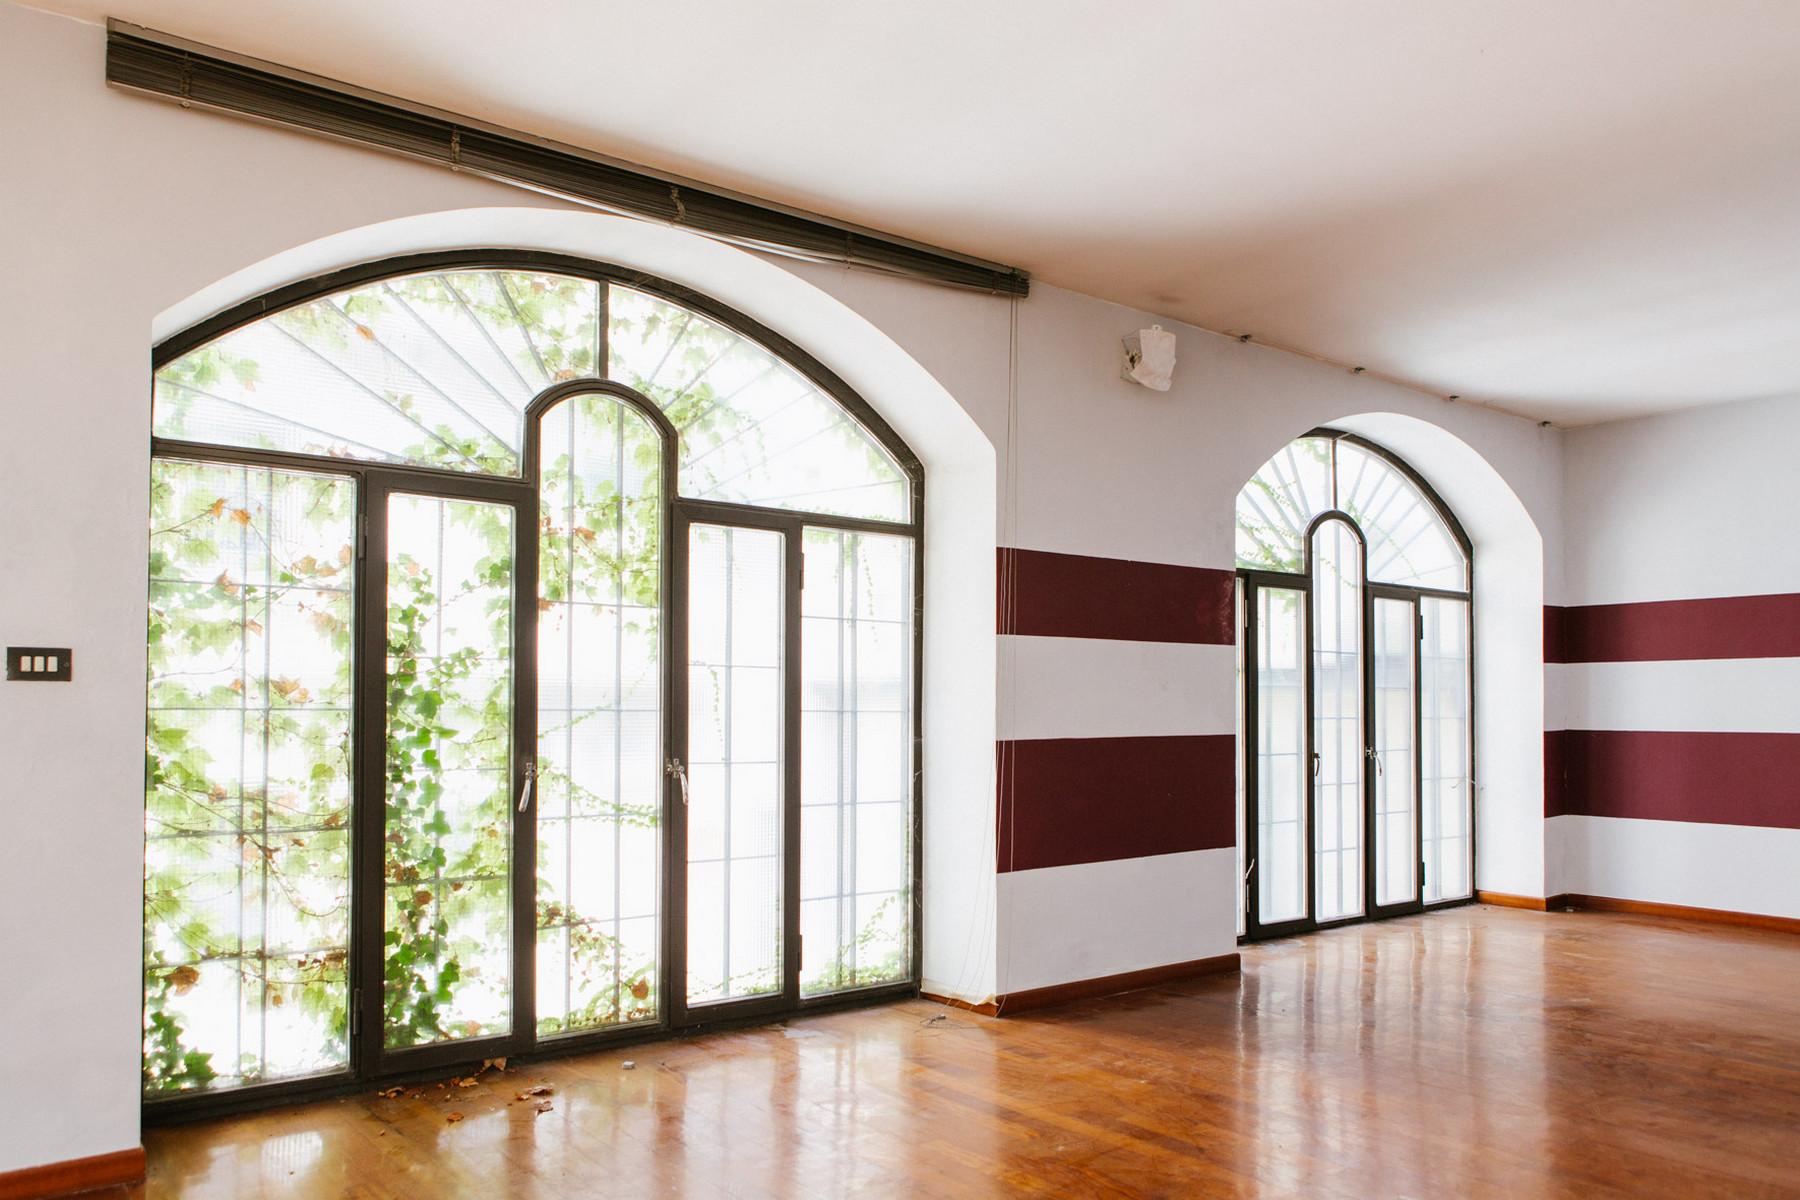 Casa indipendente in Vendita a Torino: 5 locali, 699 mq - Foto 6